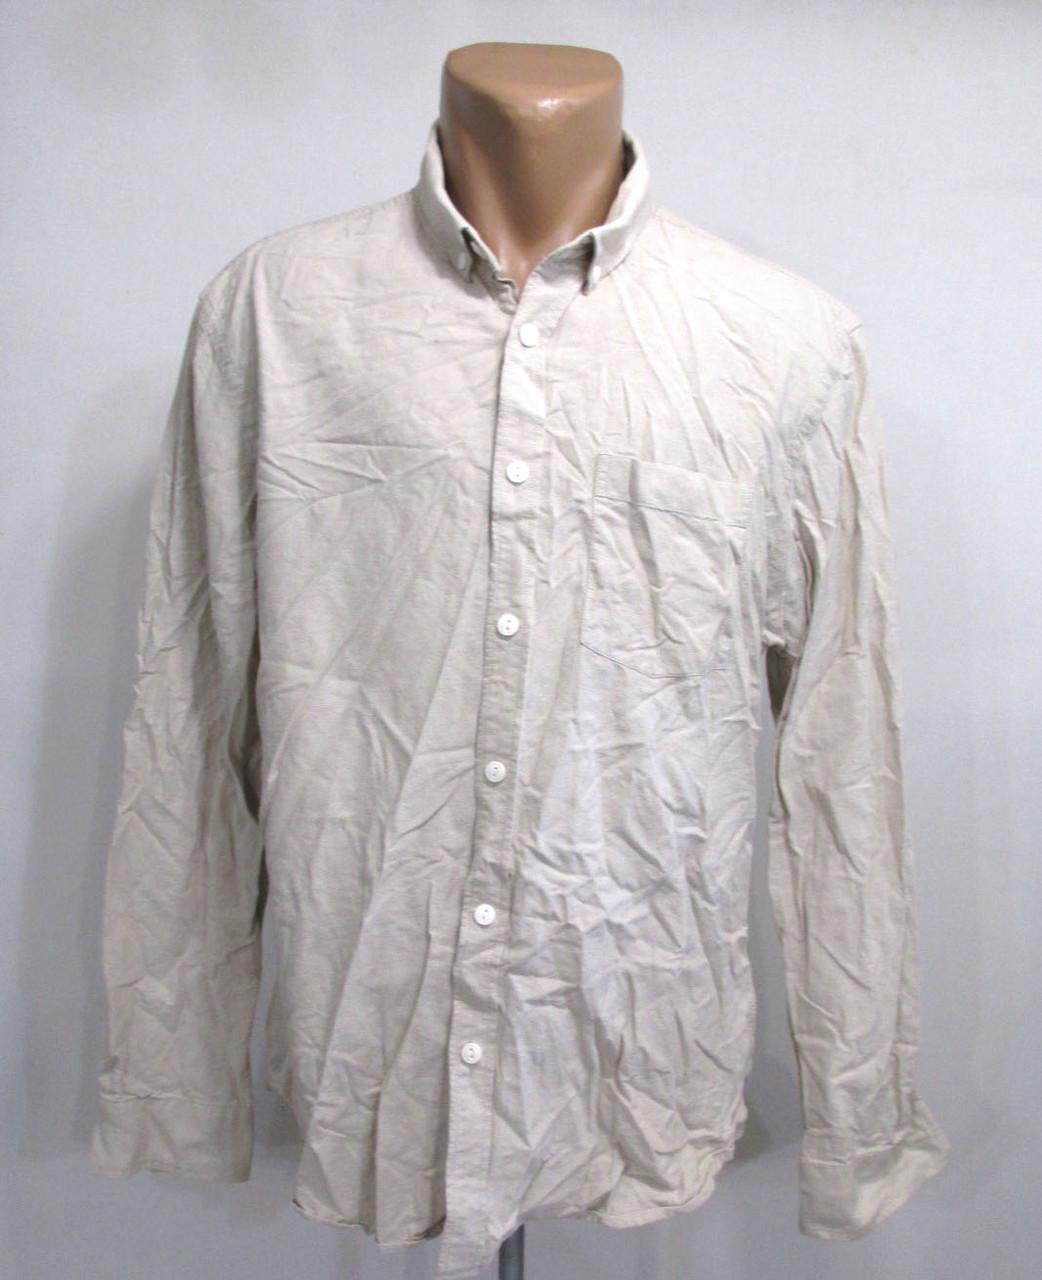 Рубашка BURTON Menswear, L, Как Новая!